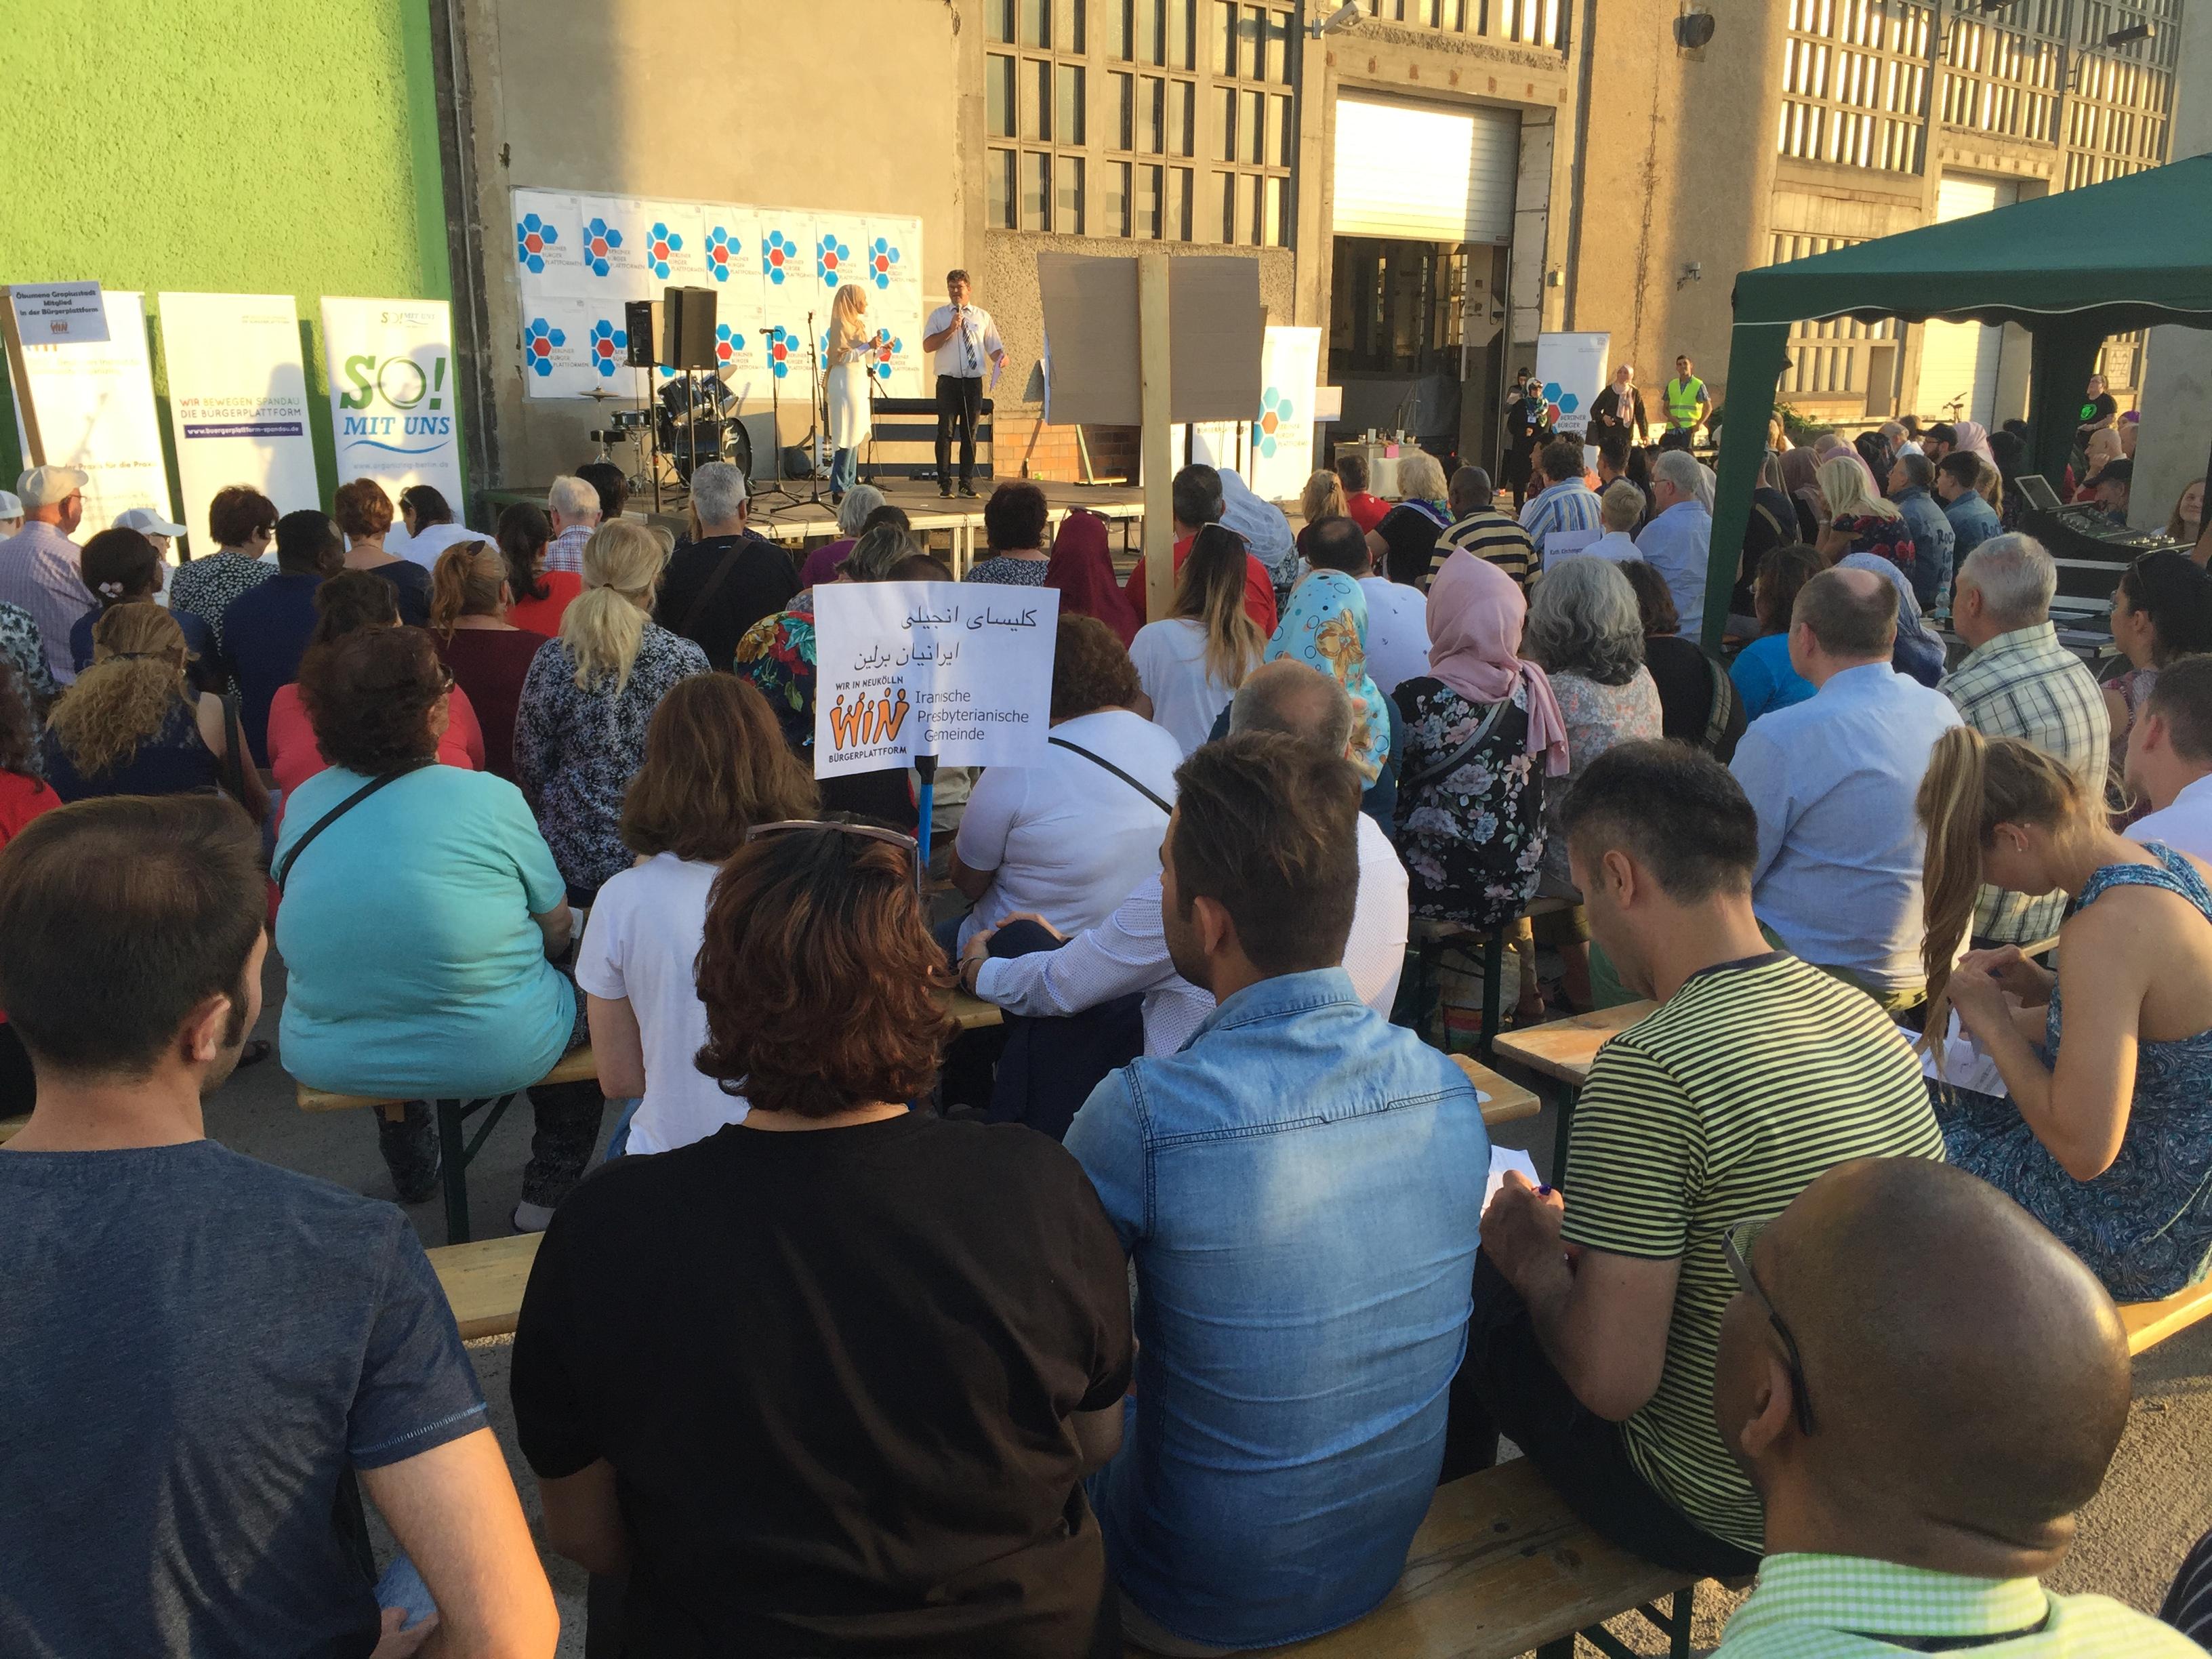 Members of the Iranian Presbyterian Church and others at the Bürgerplattform rally.